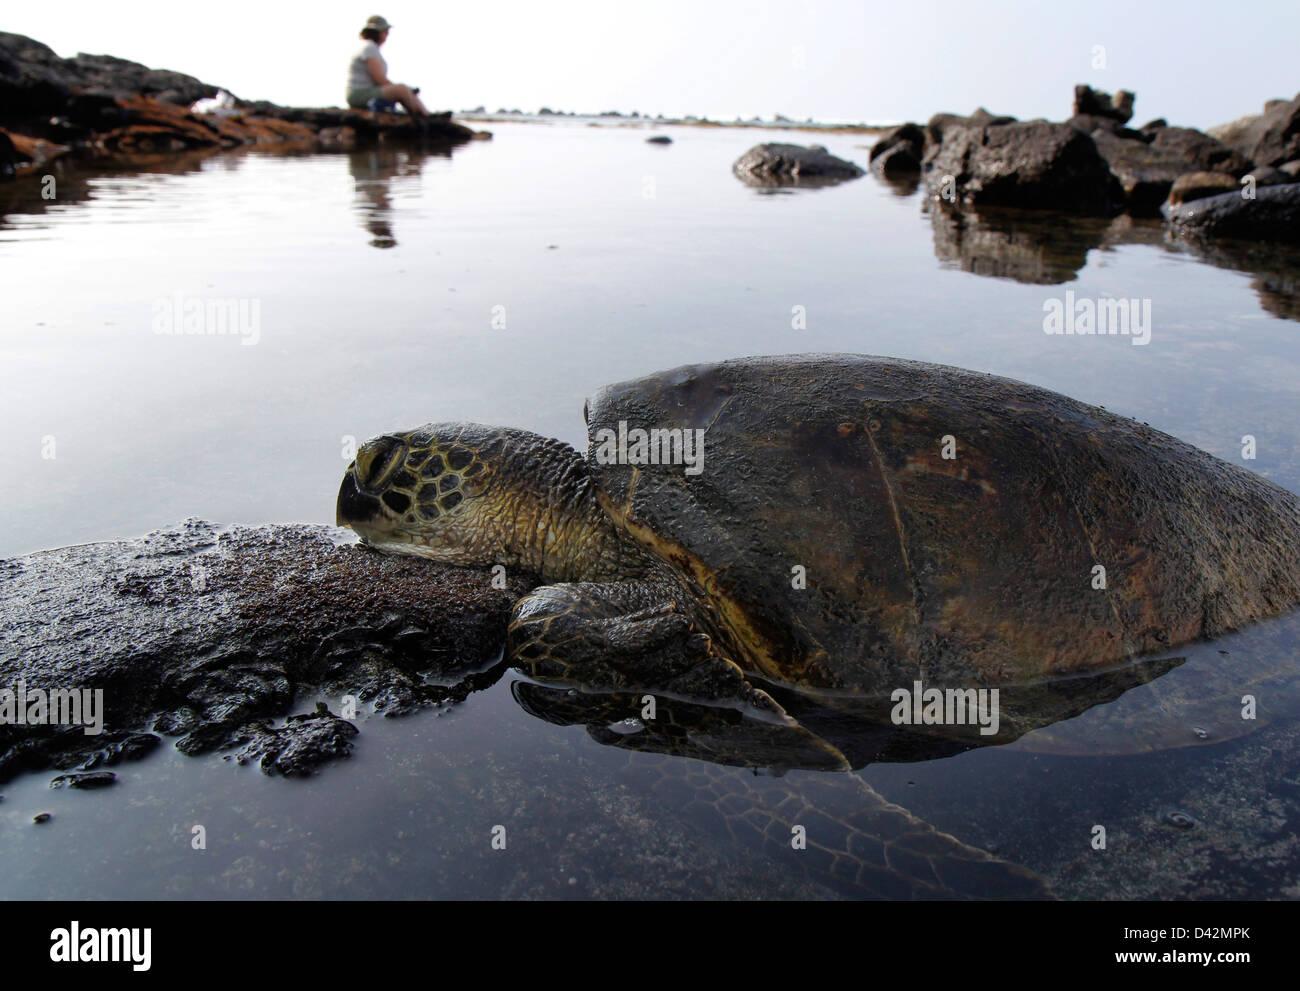 Green sea turtle basking near tourist on lava Hawaii the Big Island pacific ocean - Stock Image